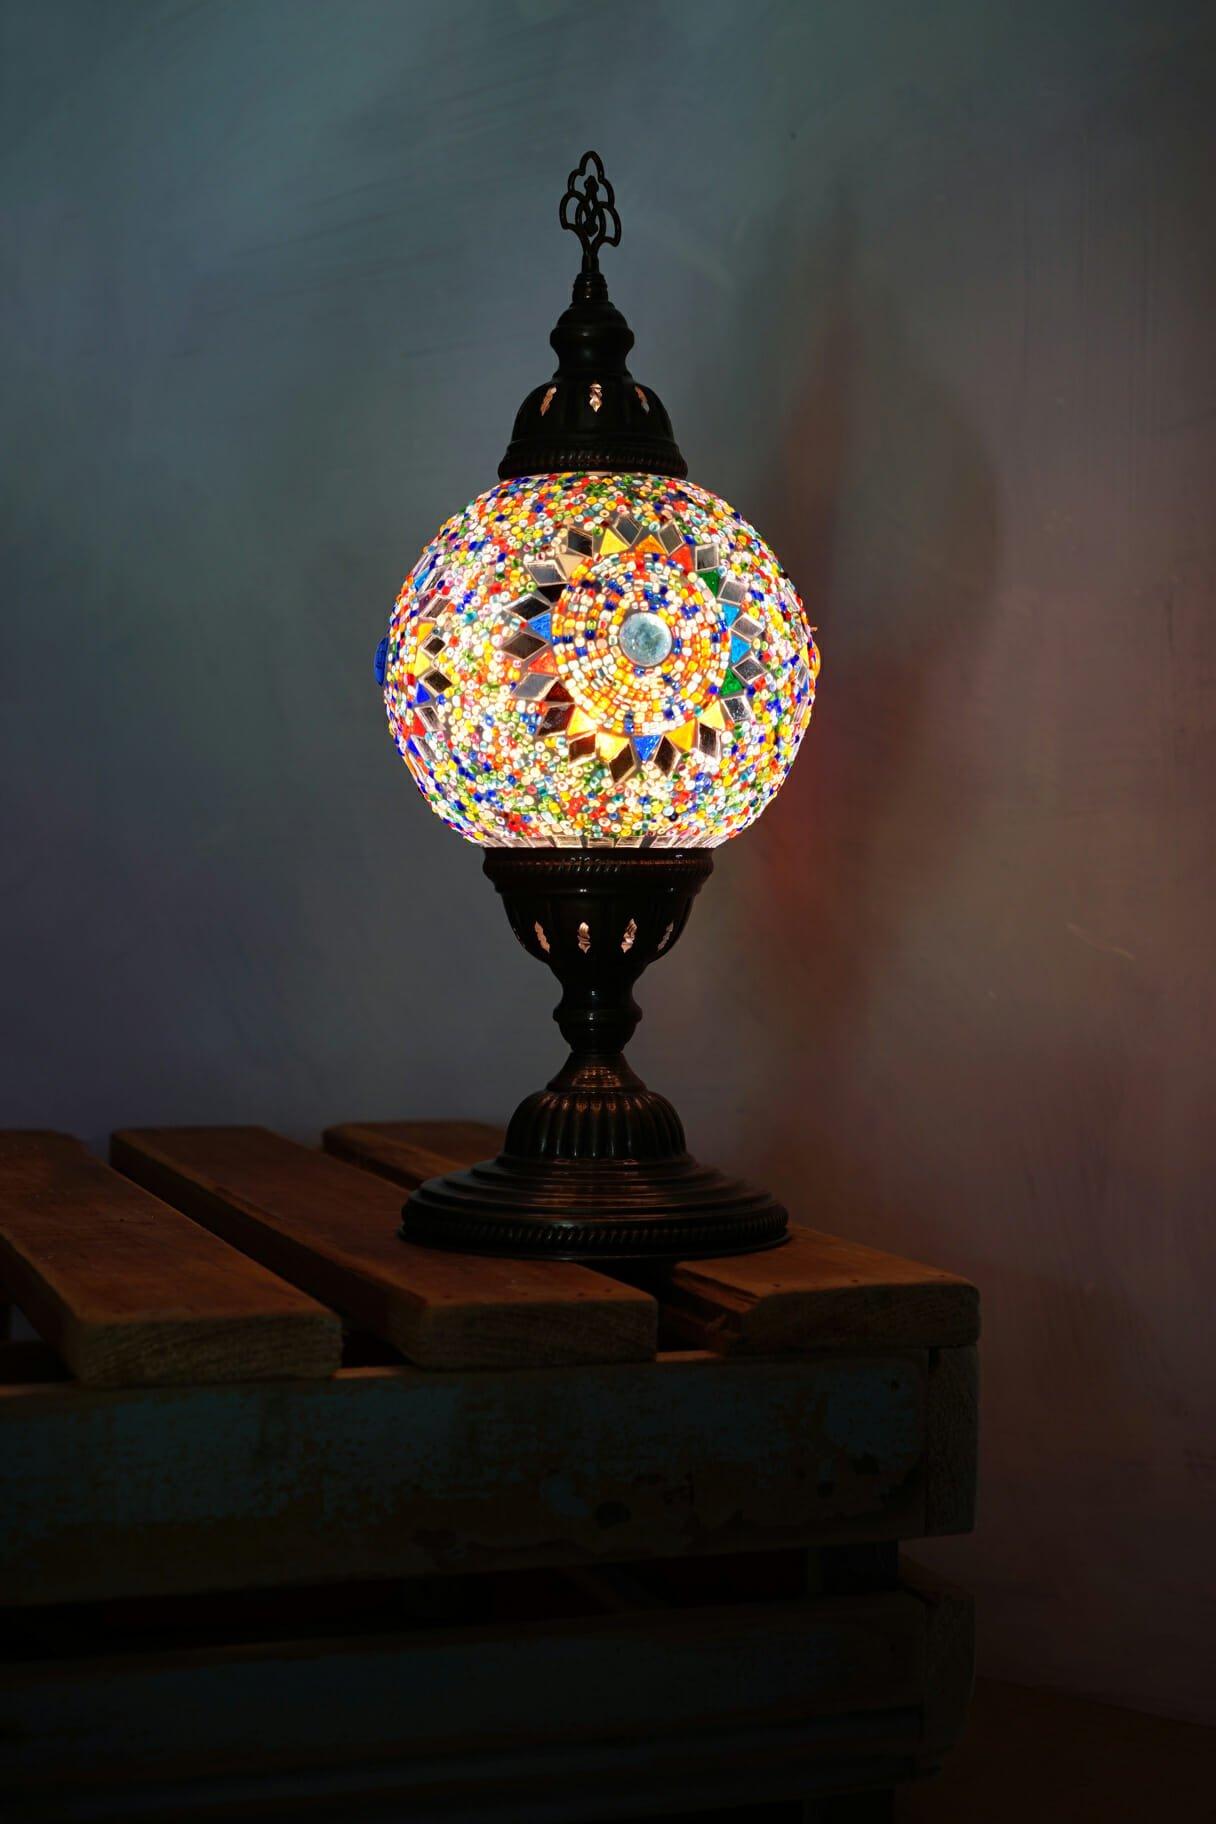 Sun Multi Coloured Globe Table Lamp The Dancing Pixie